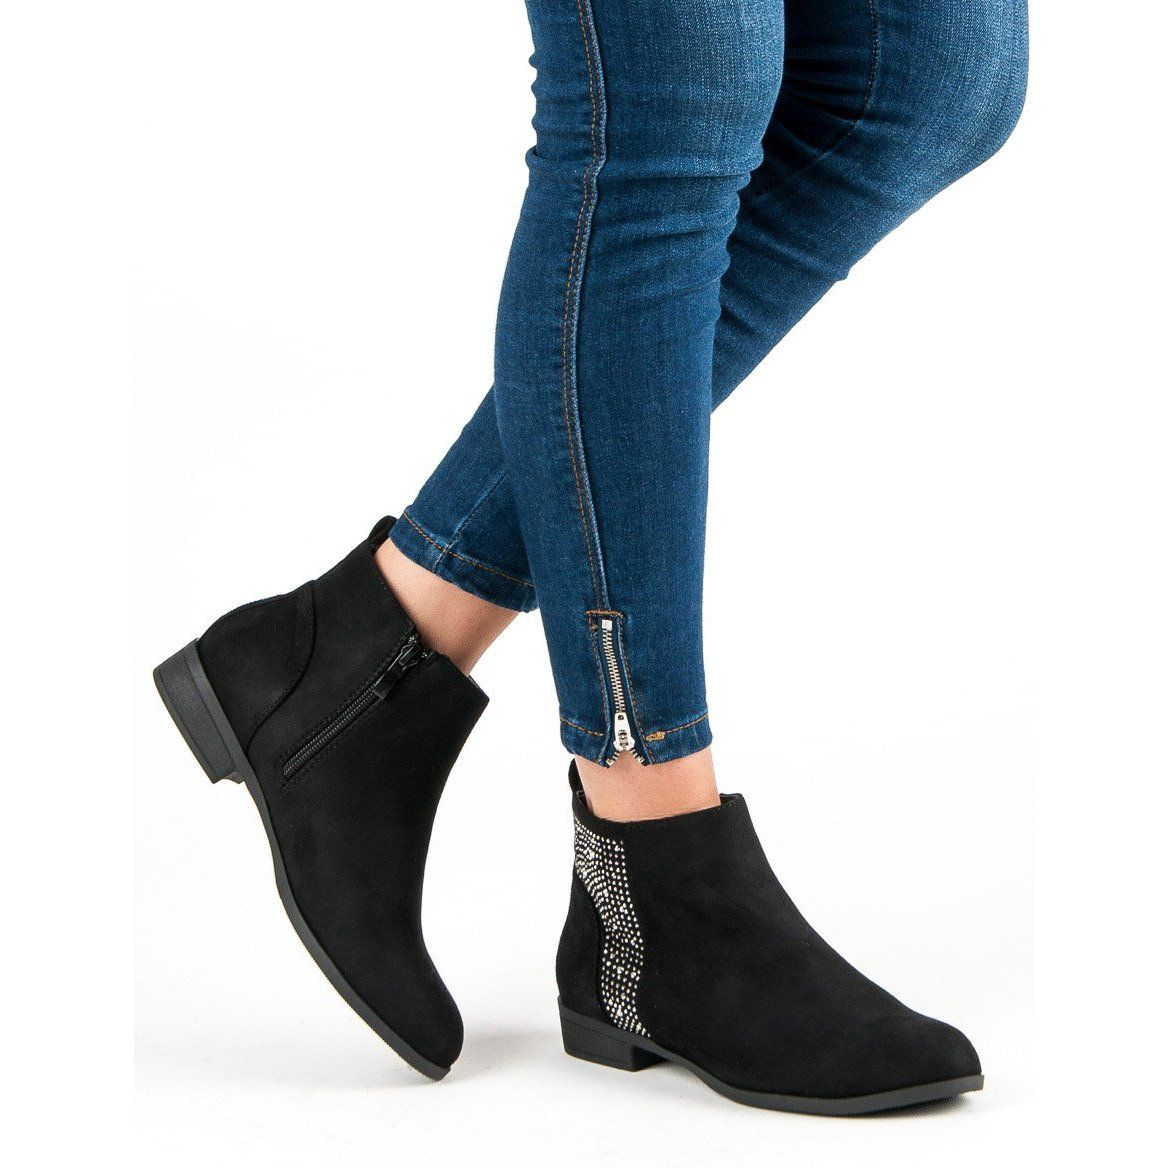 Sergio Todzi Eleganckie Plaskie Botki Czarne Ankle Boot Shoes Fashion